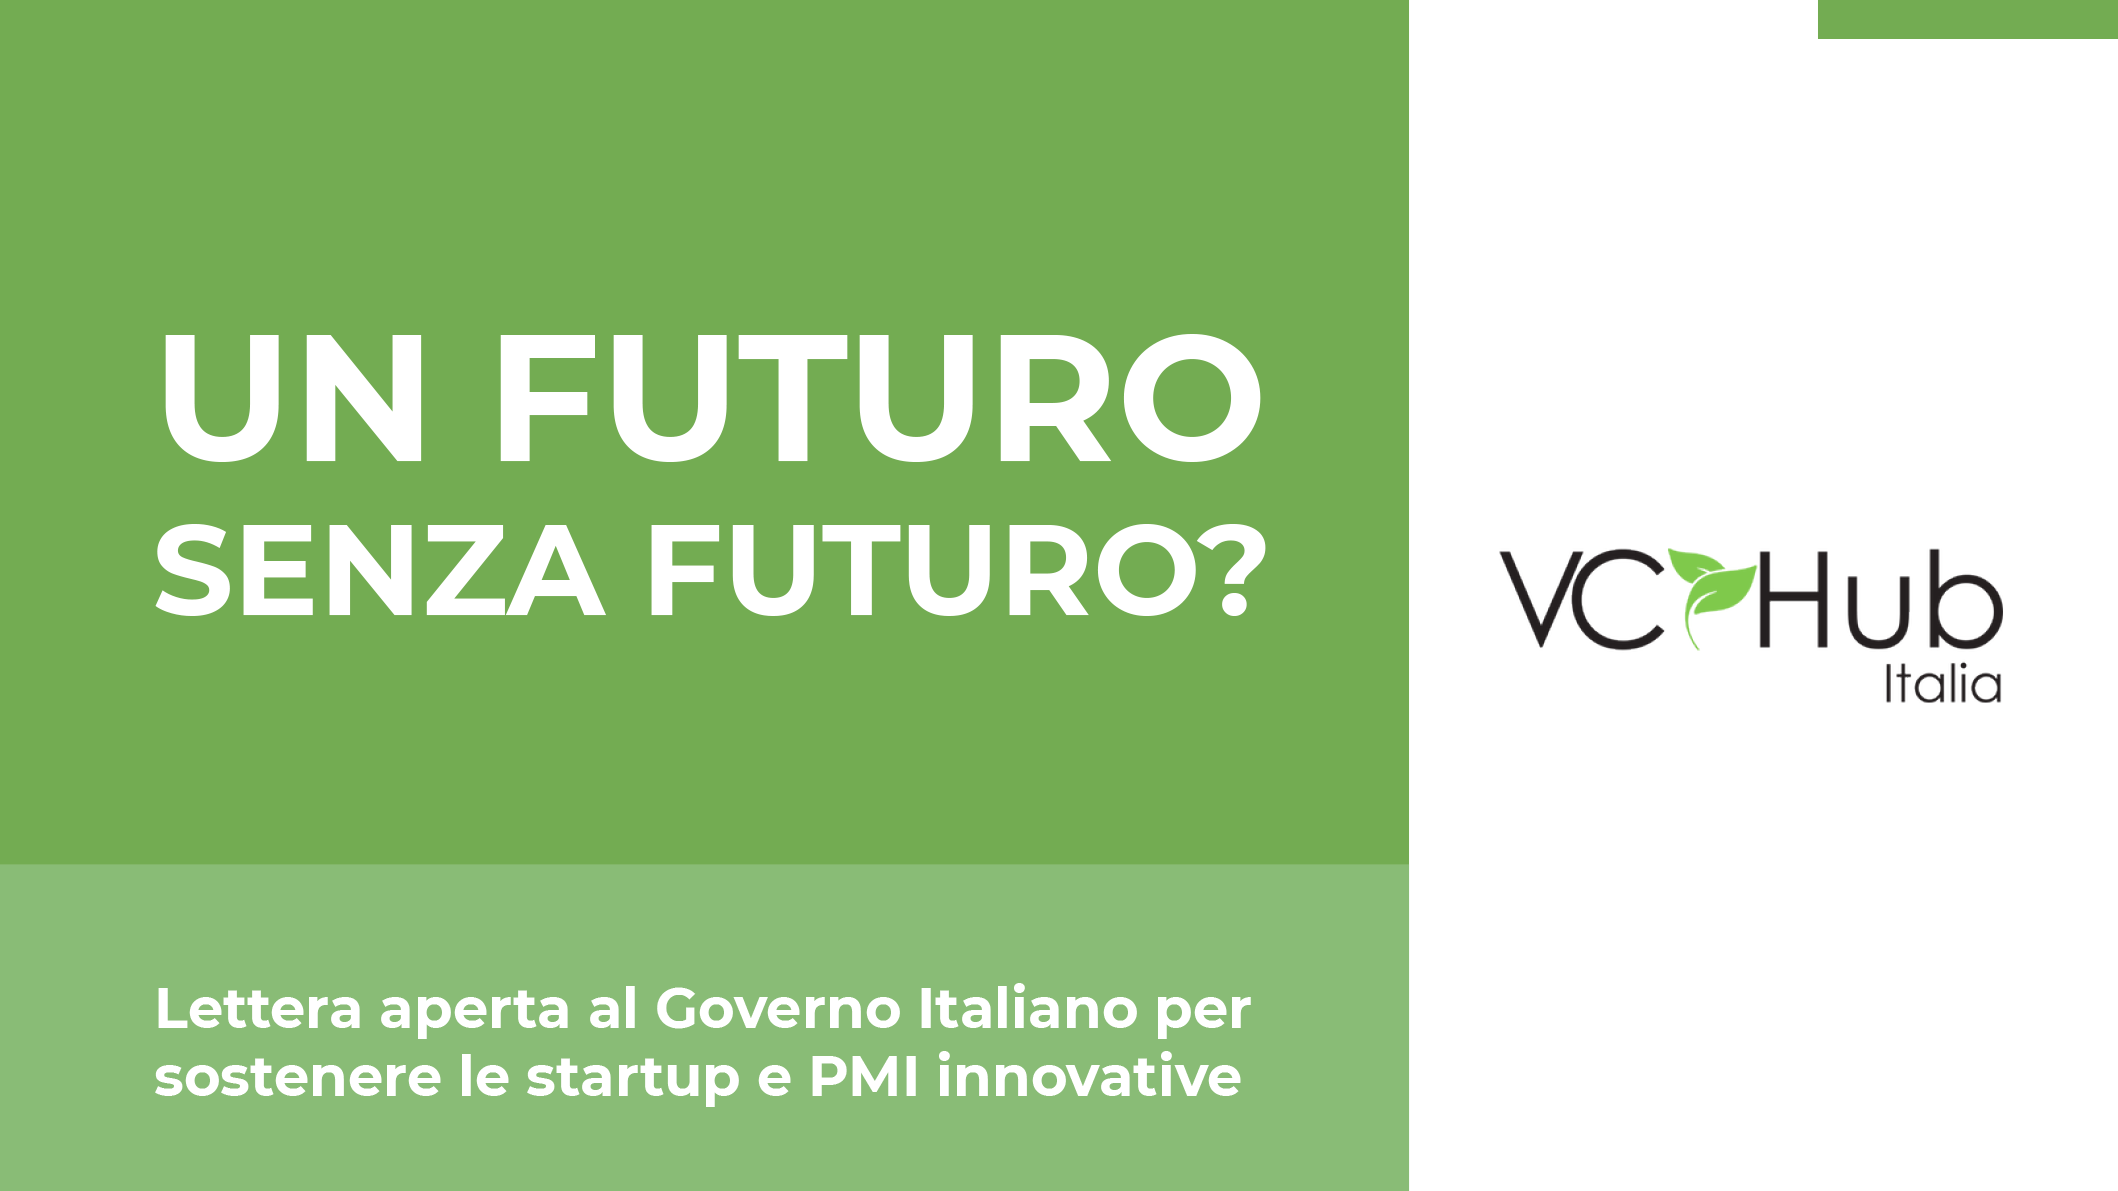 VC Hub - Futuro senza futuro